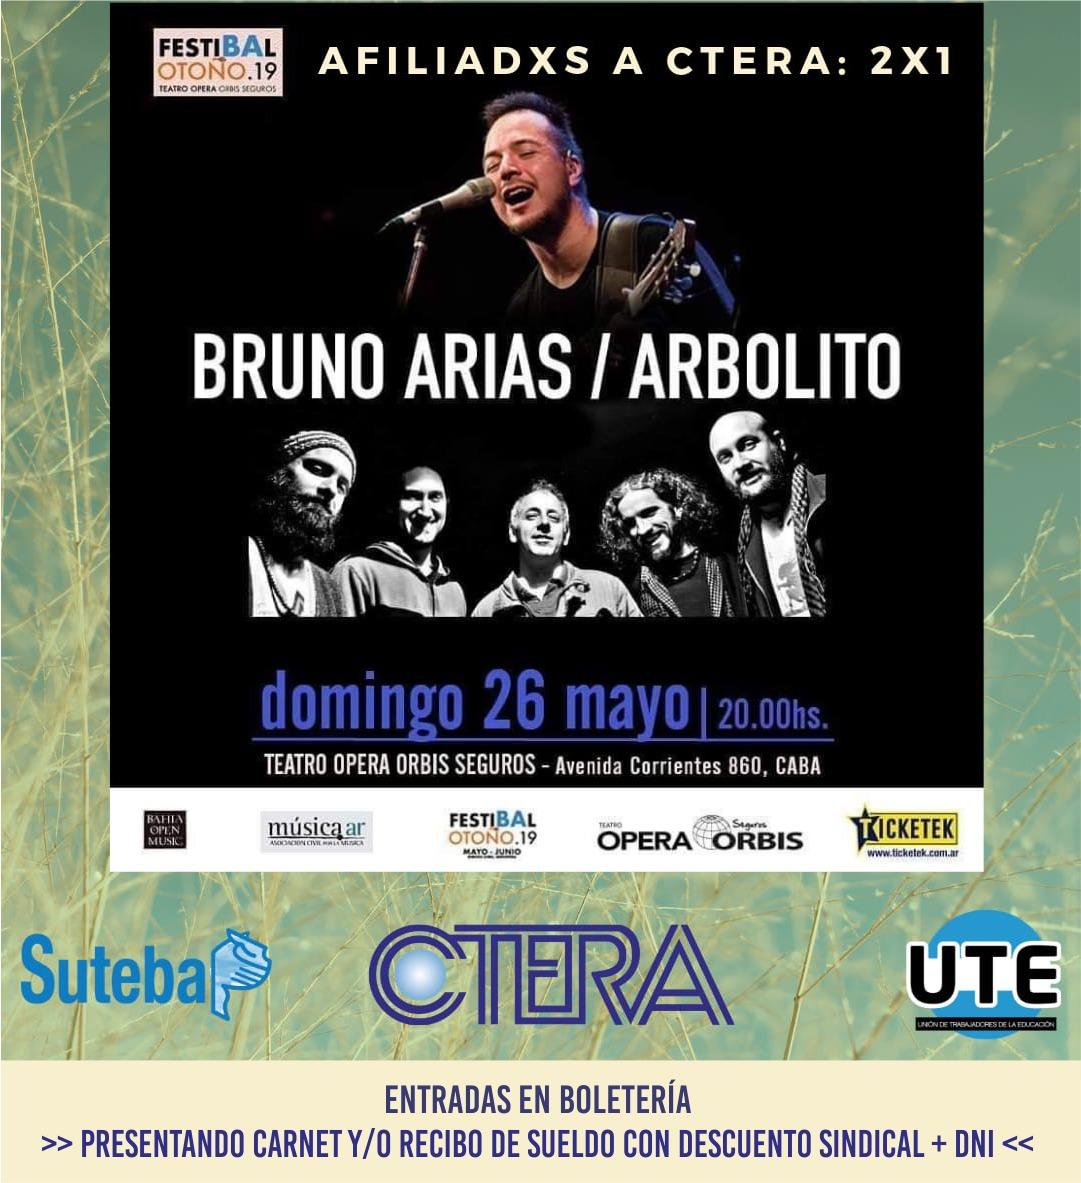 ARBOLITO y BRUNO ARIAS. Afiliadxs a UTE: 2x1